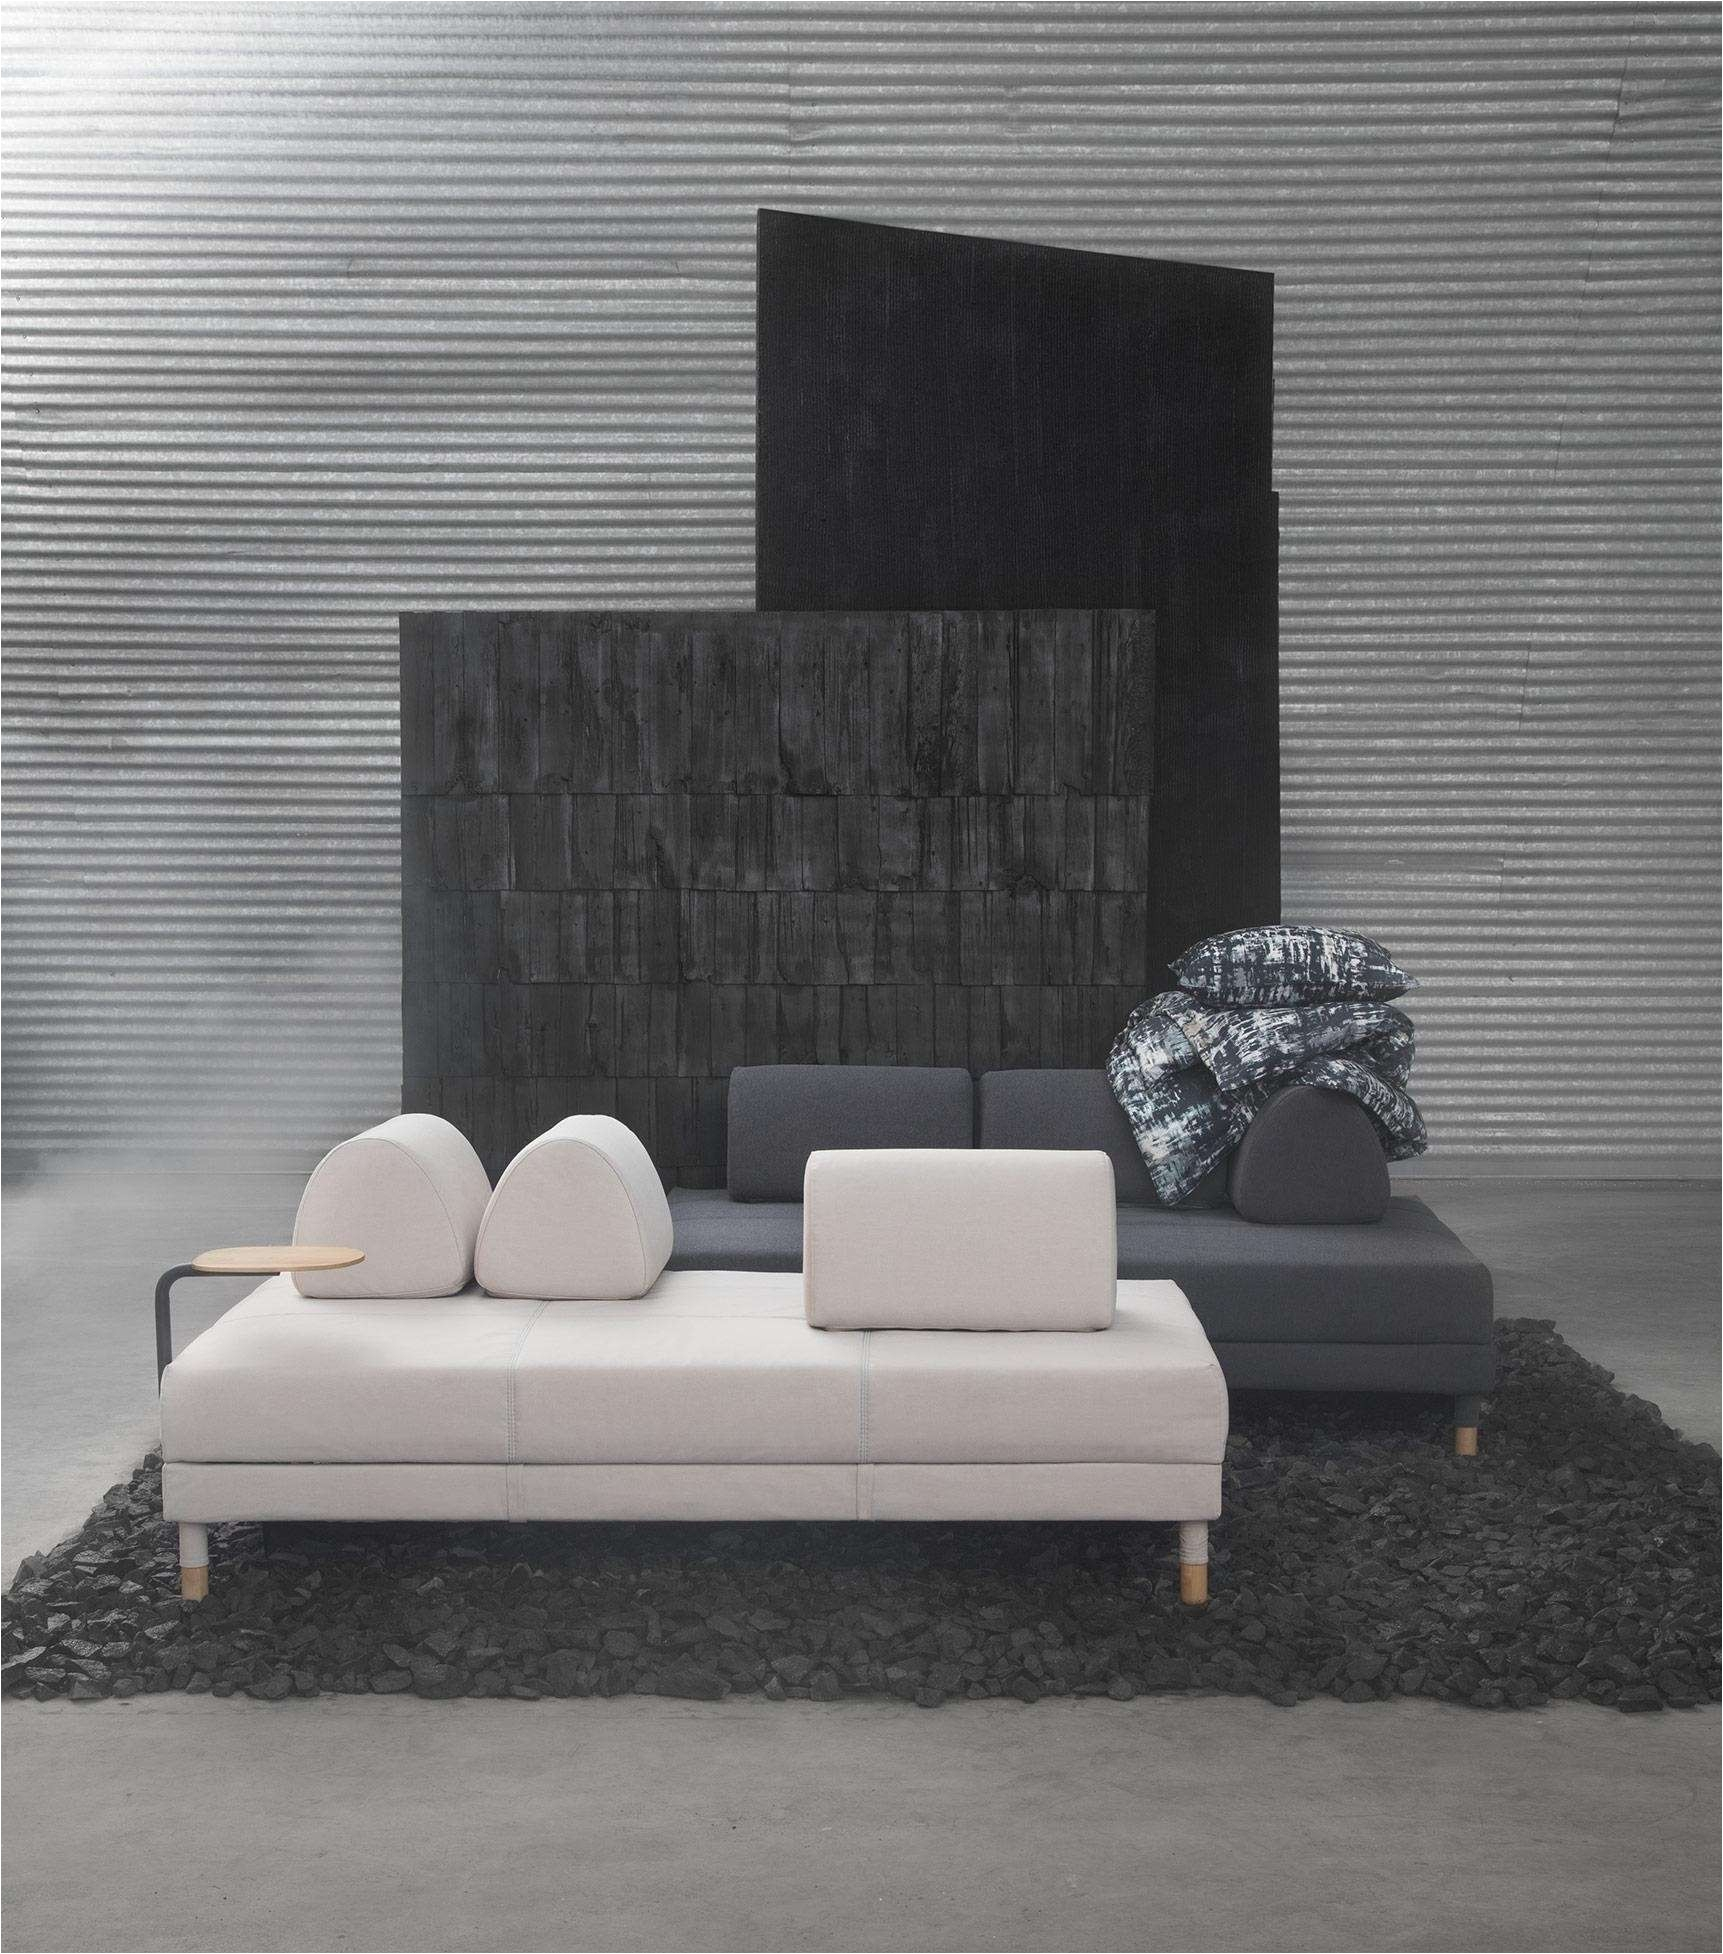 Charming Ikea Living Room Furniture In Ikea Small Home Plans Inspirational Ikea Bathroom 0d Scheme Design